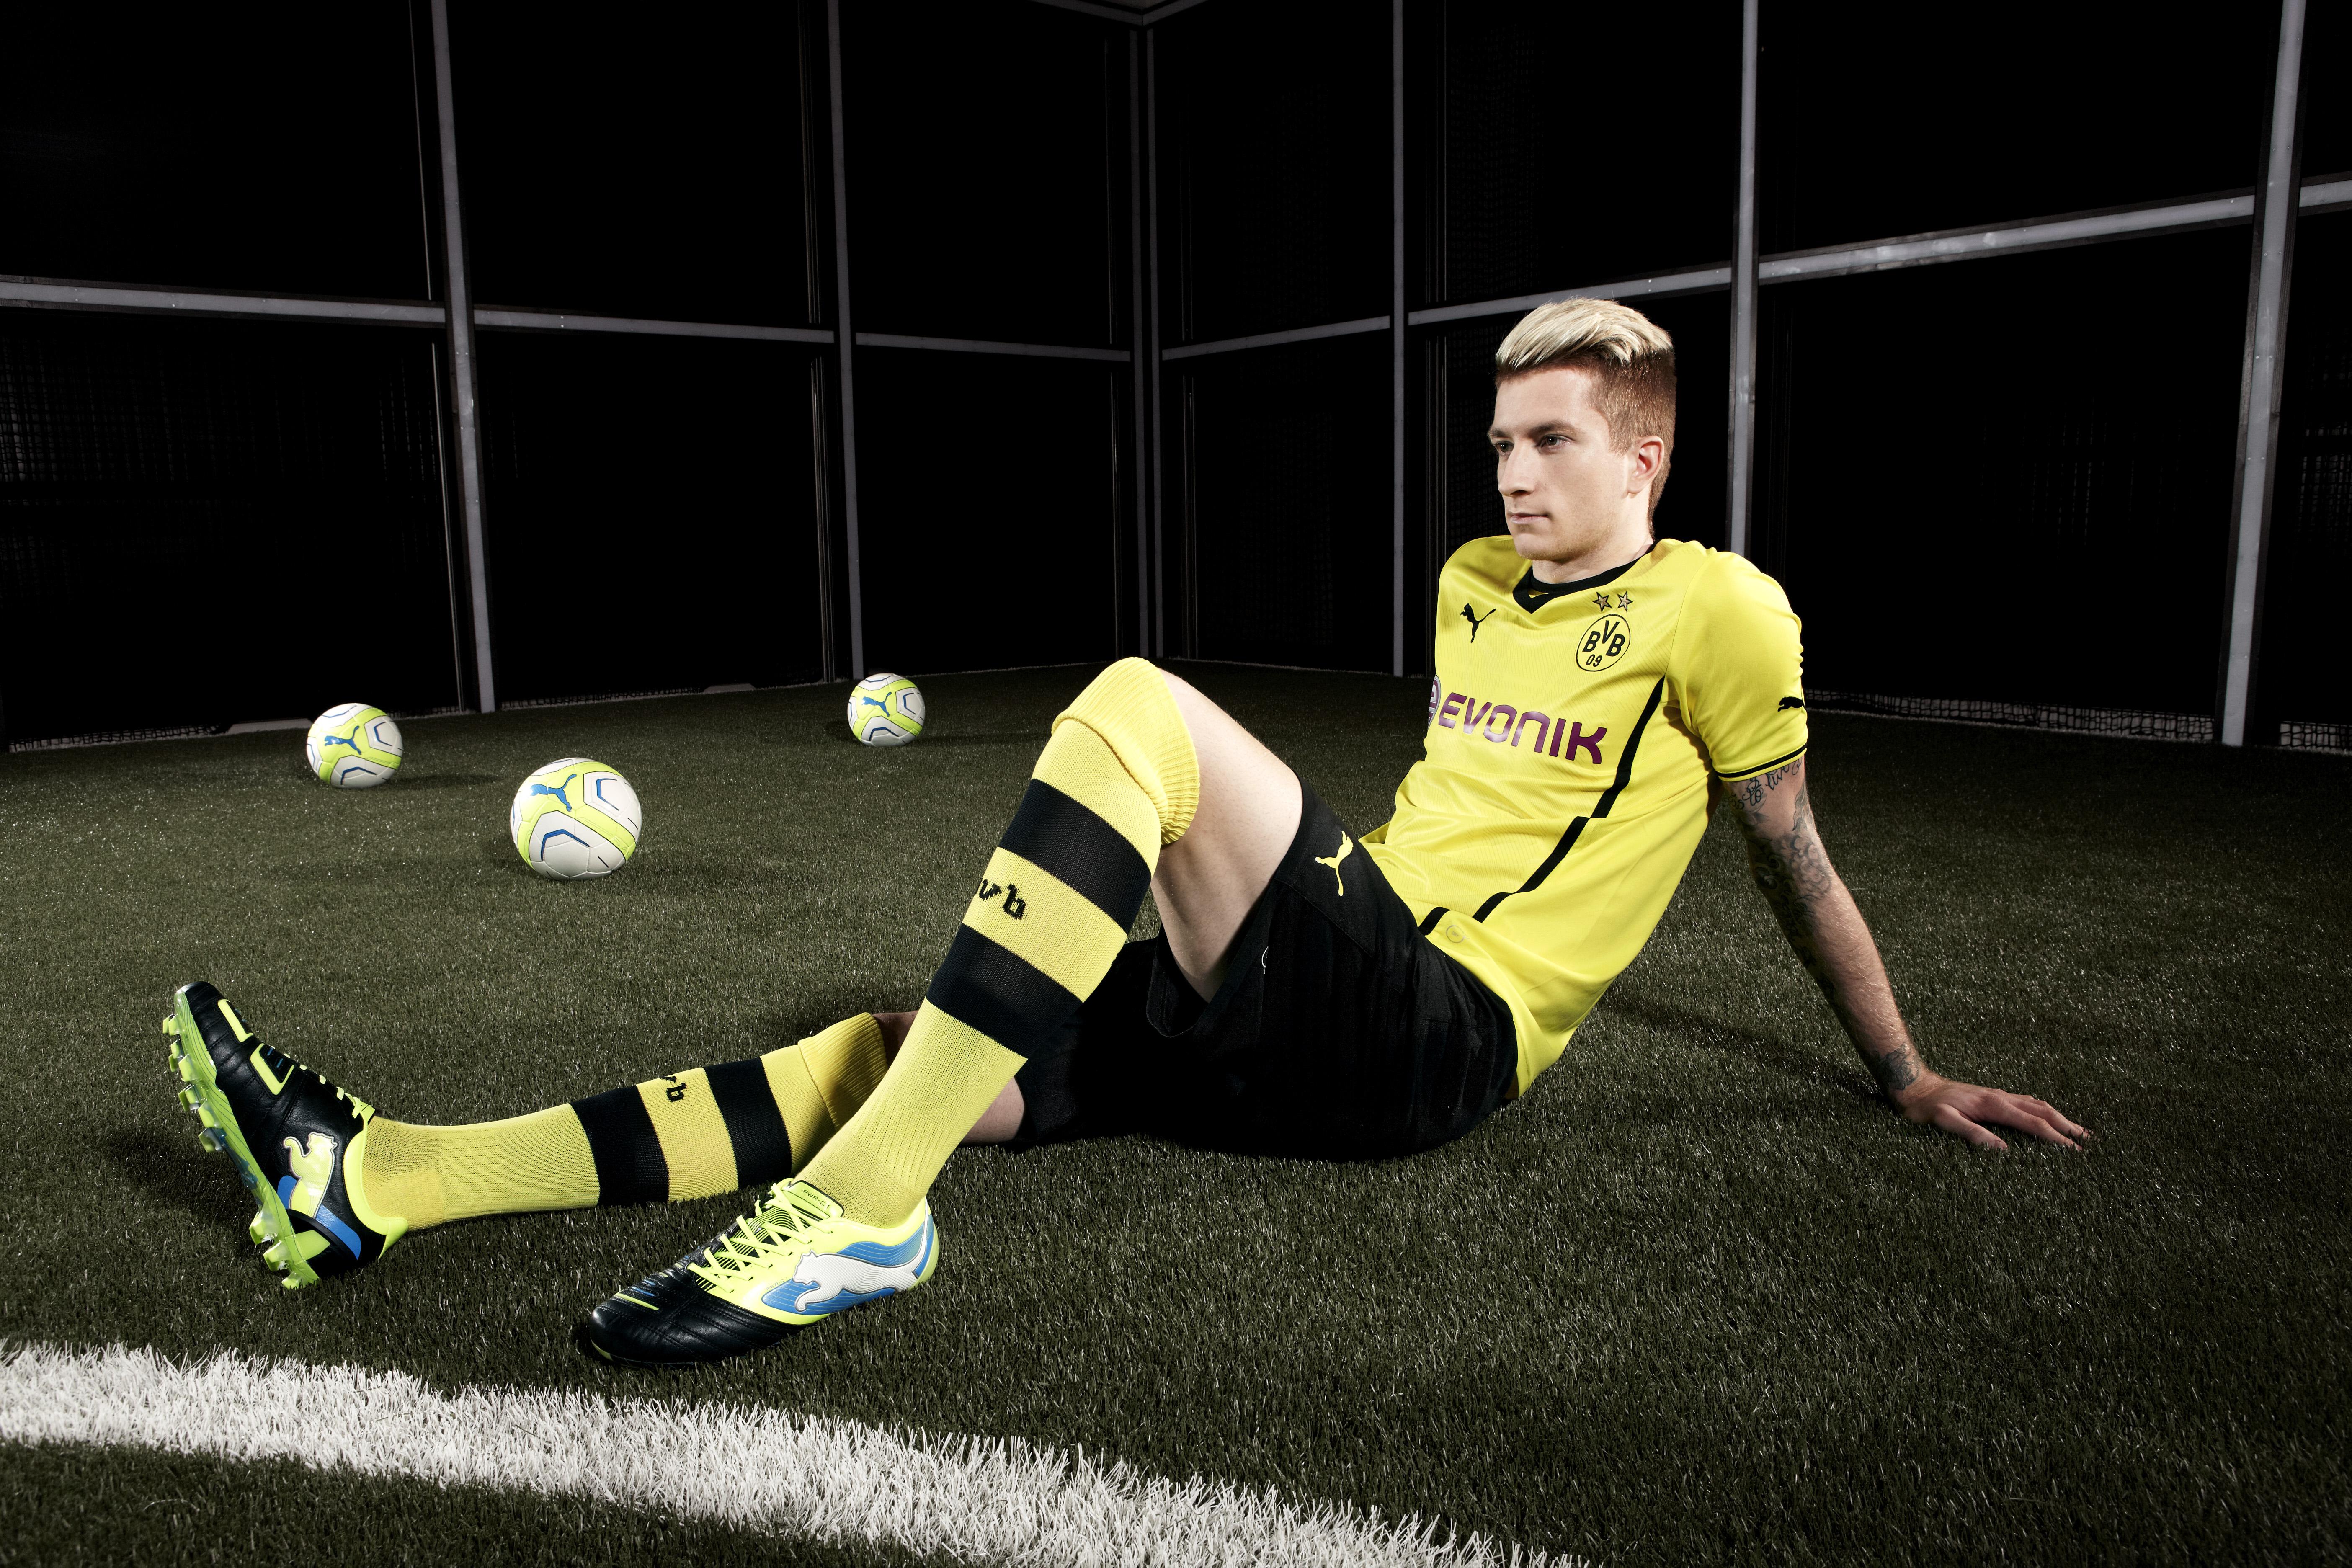 Marco Reus wearing the latest PUMA PowerCat 1 FG football boot.